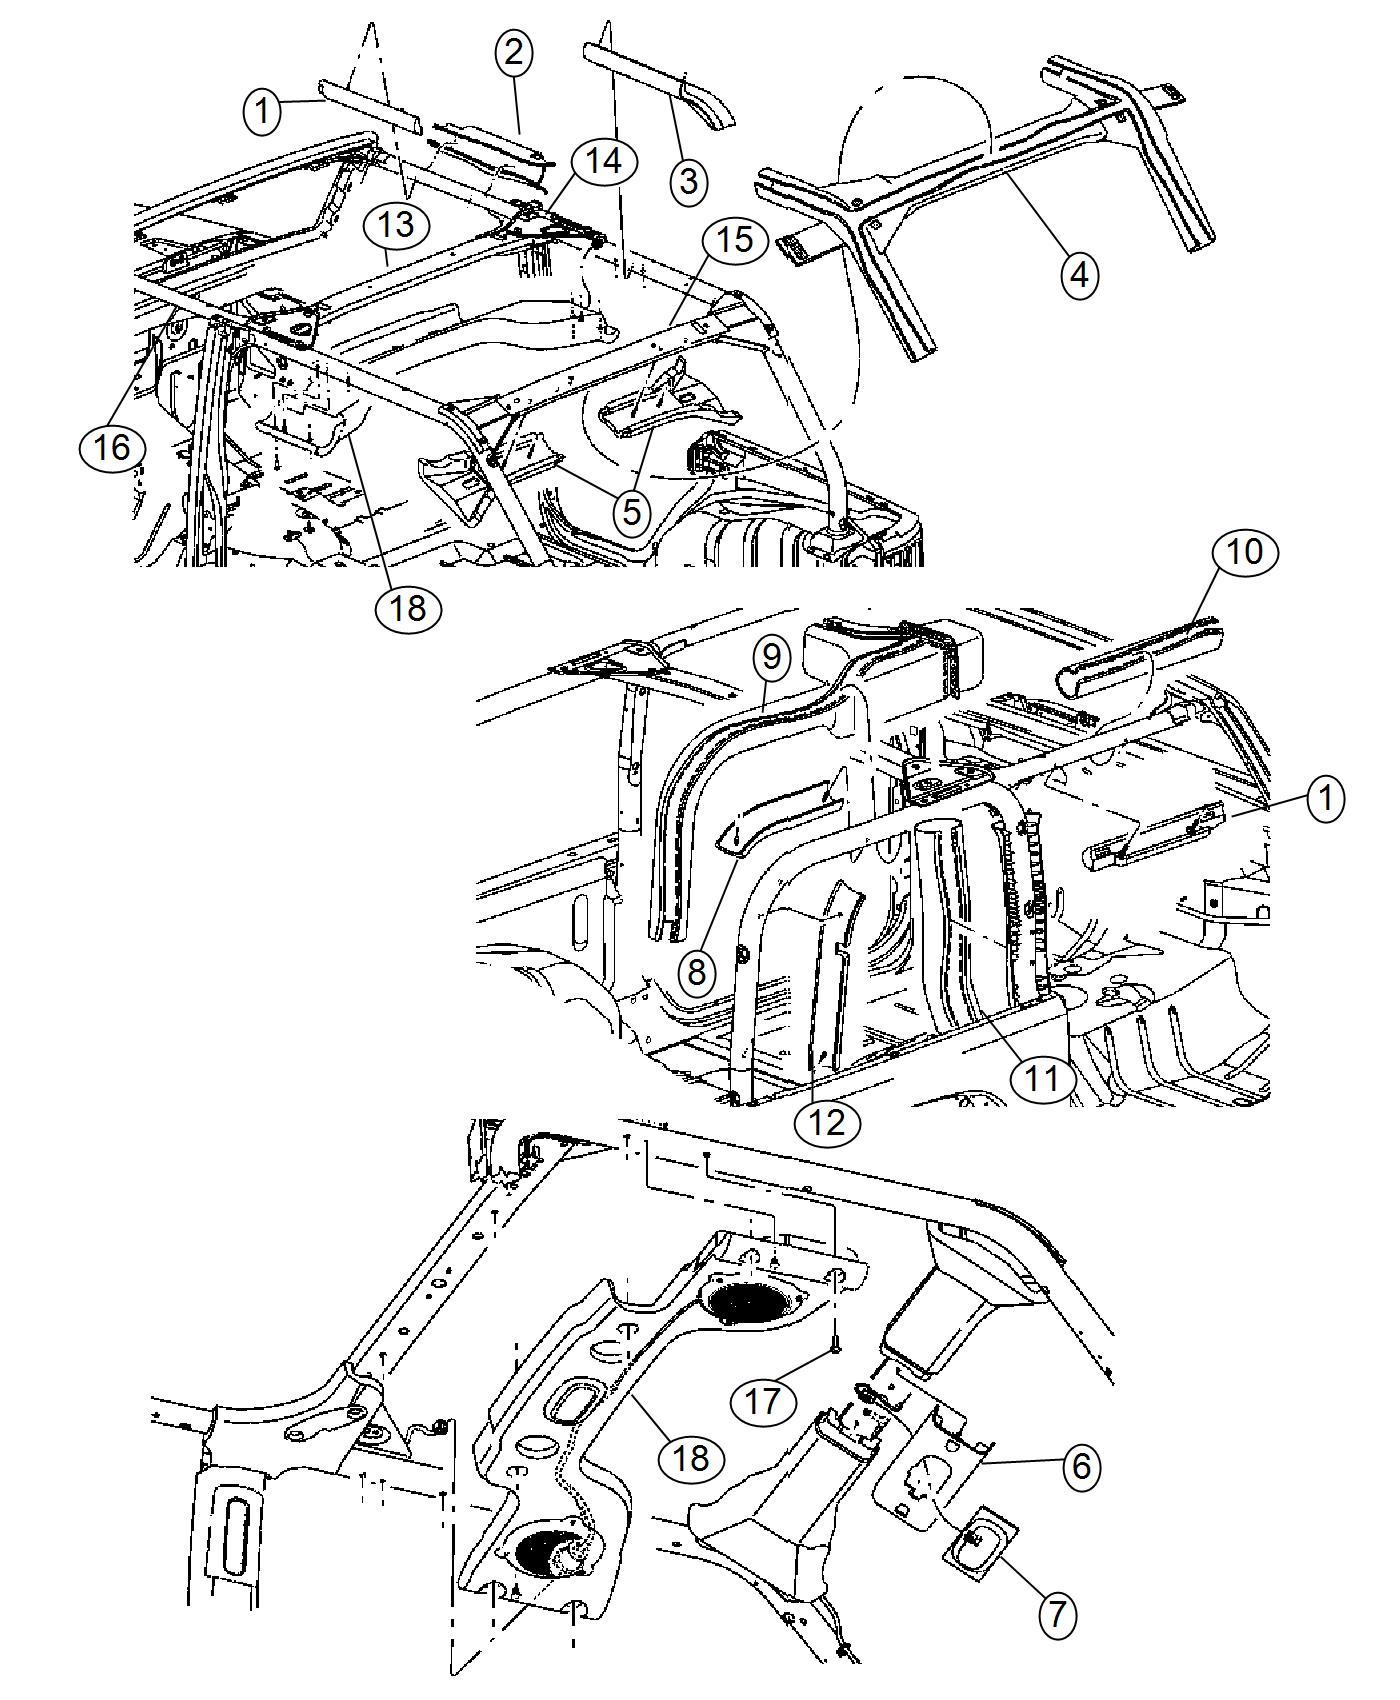 Jeep Wrangler Unlimited Rubicon 3 6l V6 A T 4x4 Side